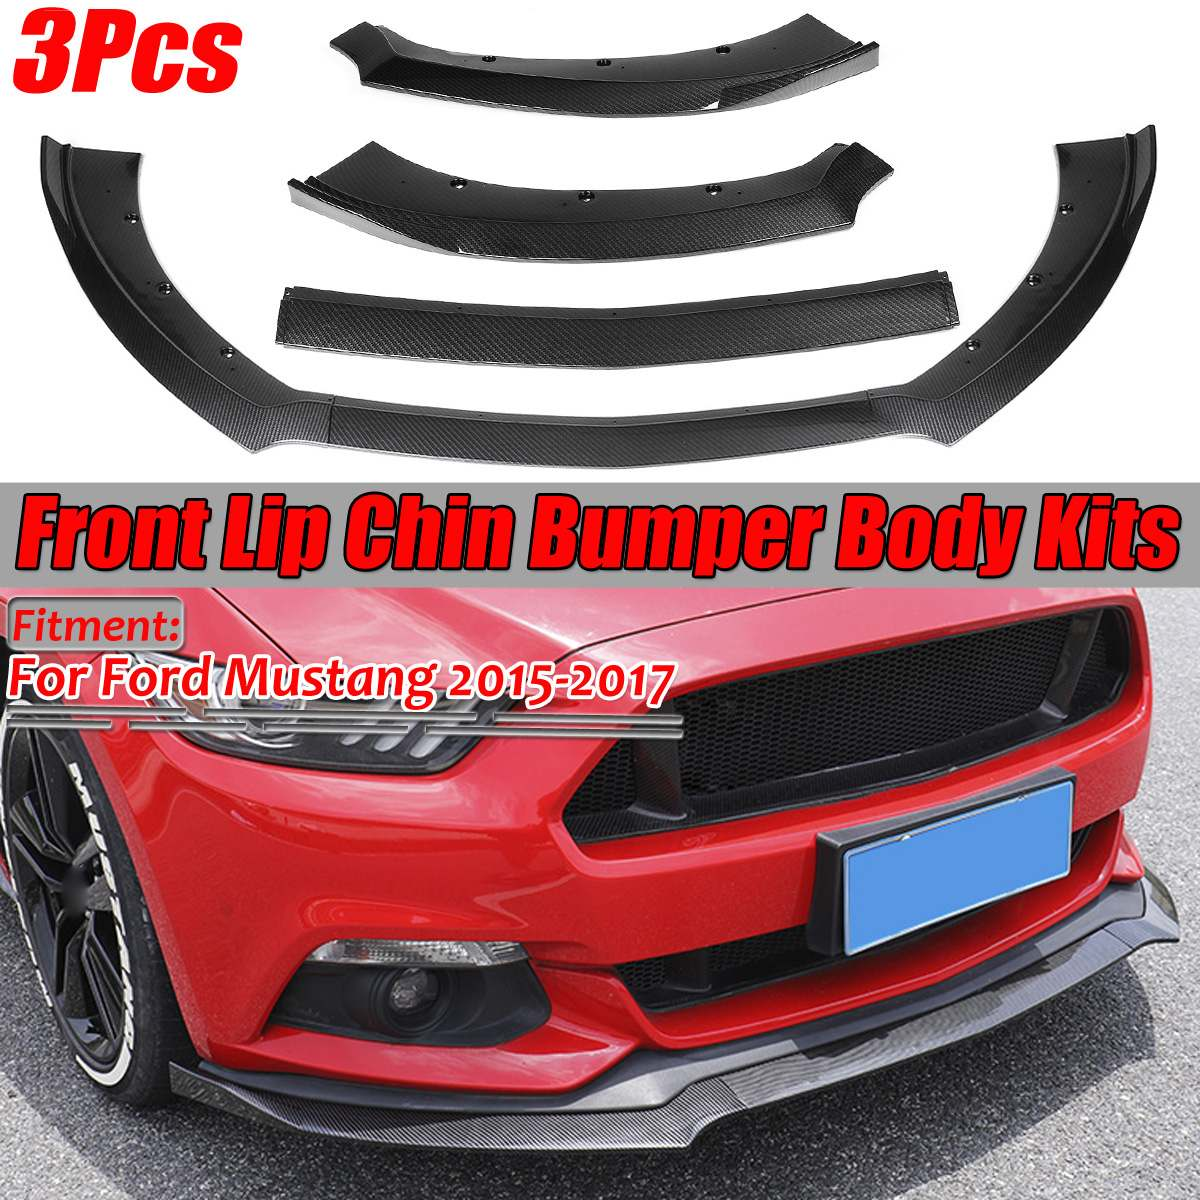 3 adet karbon Fiber bakır/siyah araba ön tampon Splitter dudak difüzör Spoiler tampon vücut kitleri ford Mustang için 2015 2016 2017